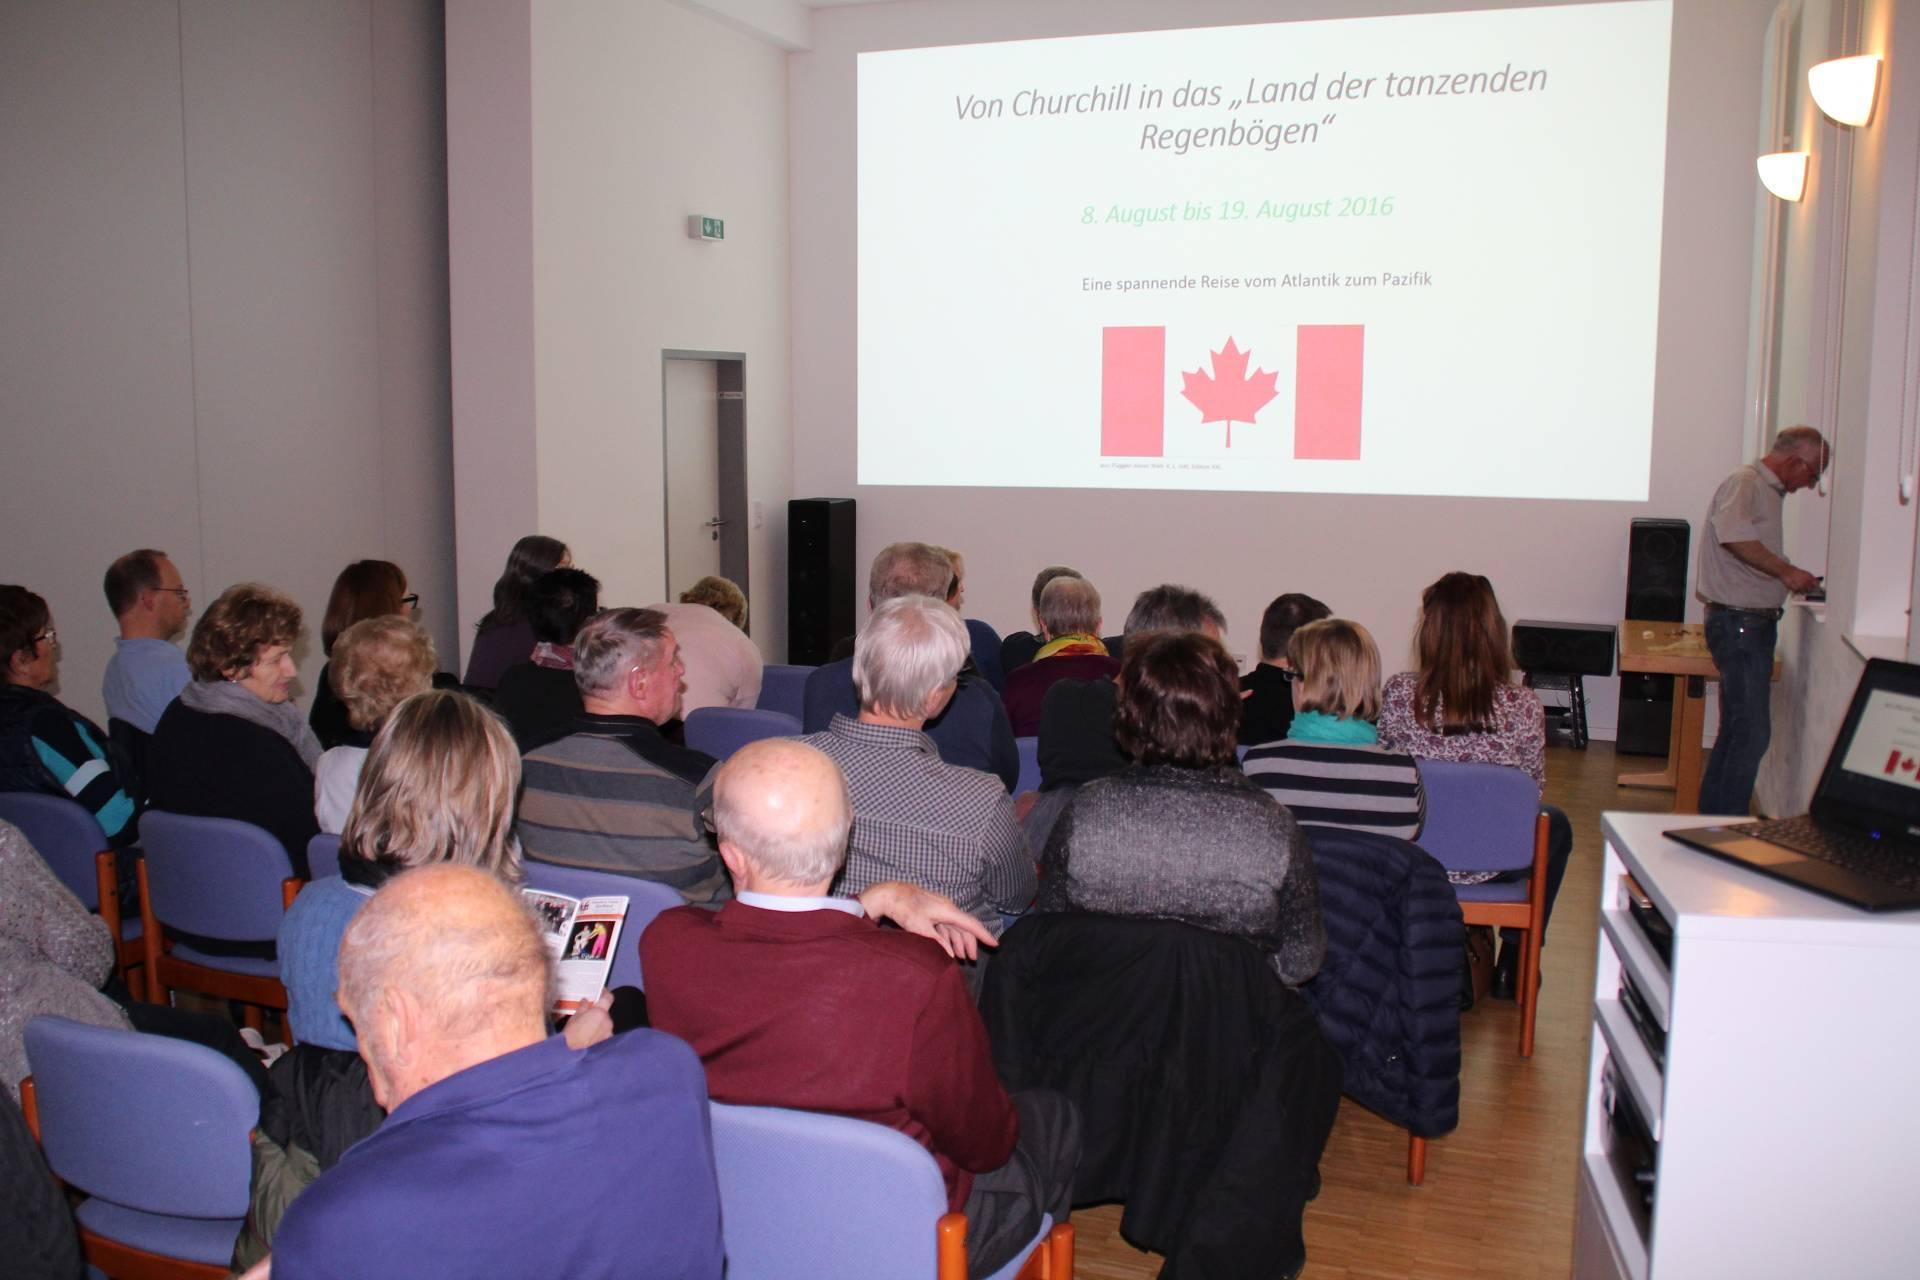 Peter-Joachim Focke begrüßte die Kanada-Fans im Generationenhaus Bahnhof Hümme.